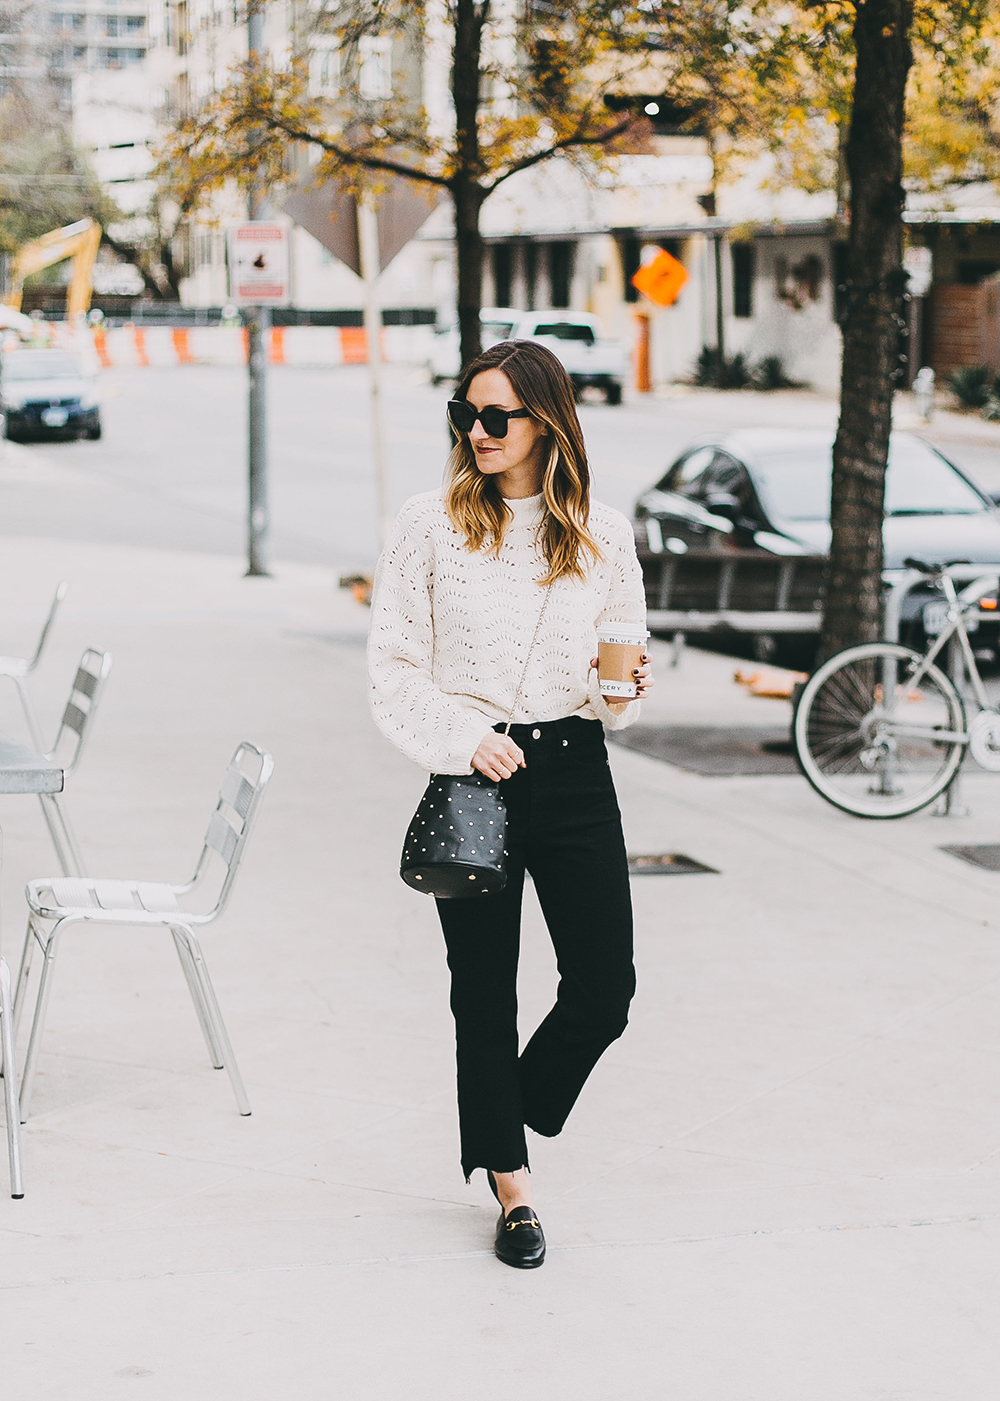 livvyland-blog-olivia-watson-austin-texas-fashion-blogger-white-knit-sweater-rag-bone-crop-flare-black-jeans-gucci-loafers-6